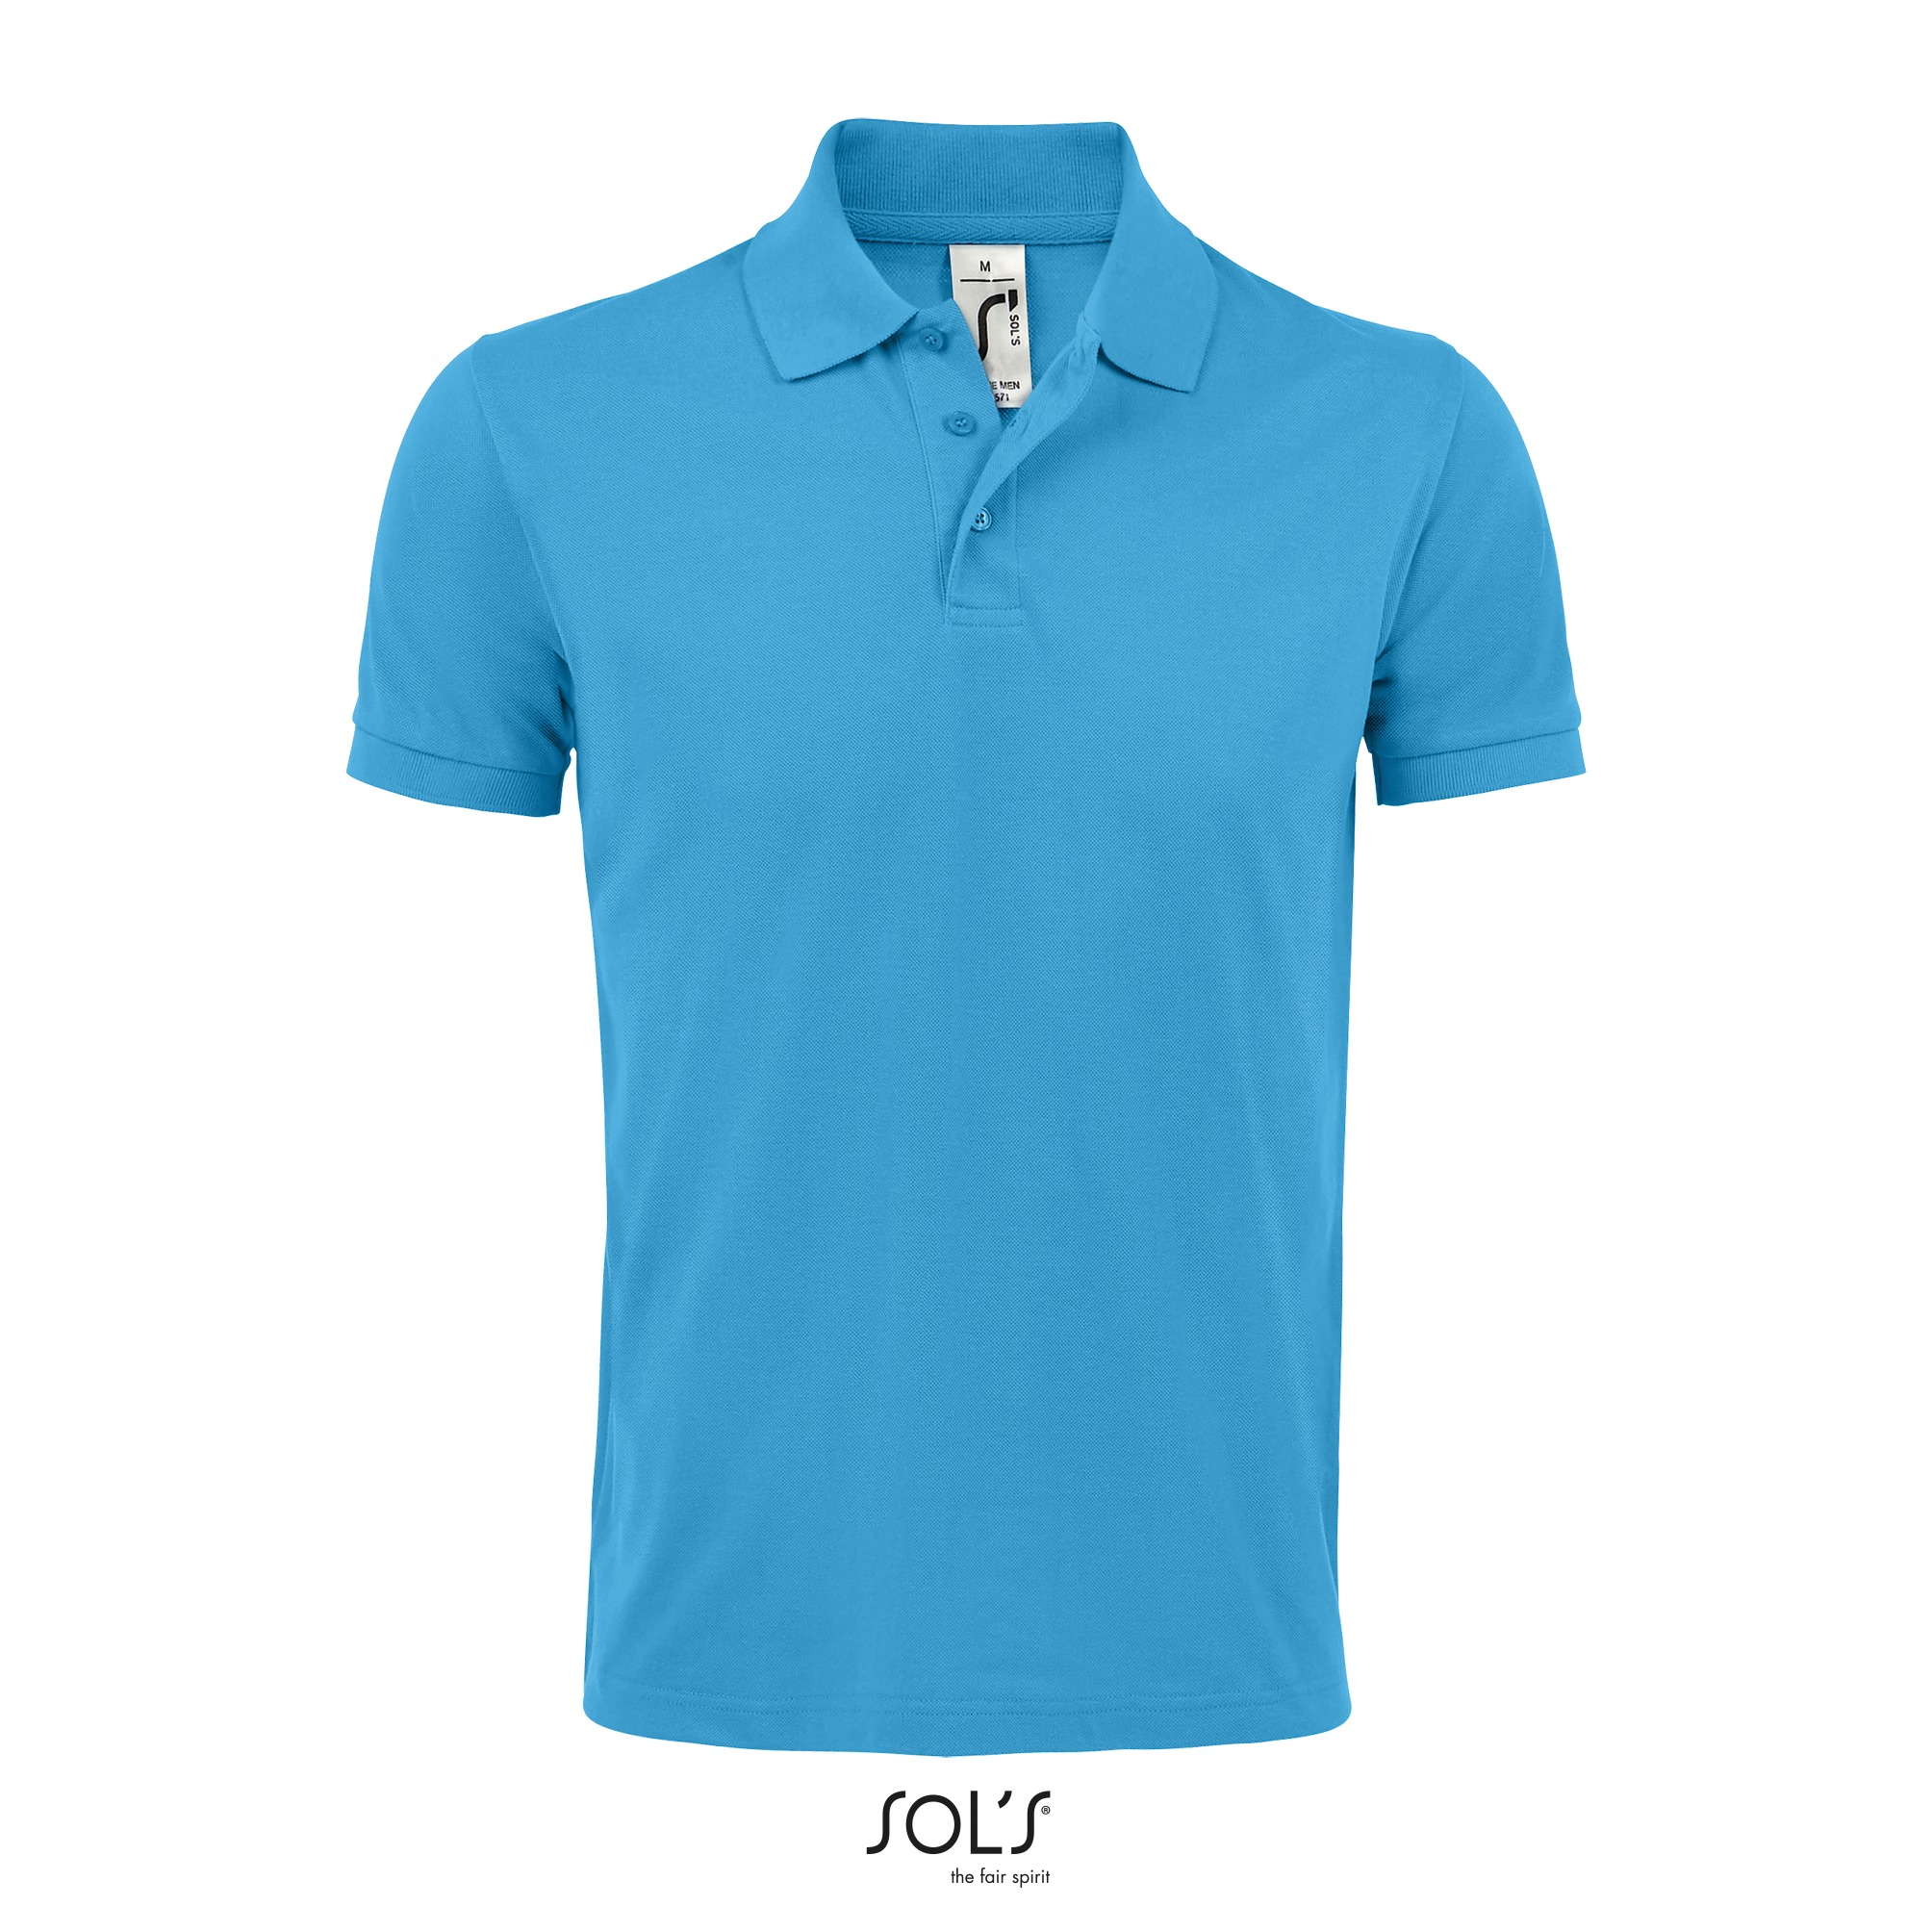 Polo homme - 1-1044-25